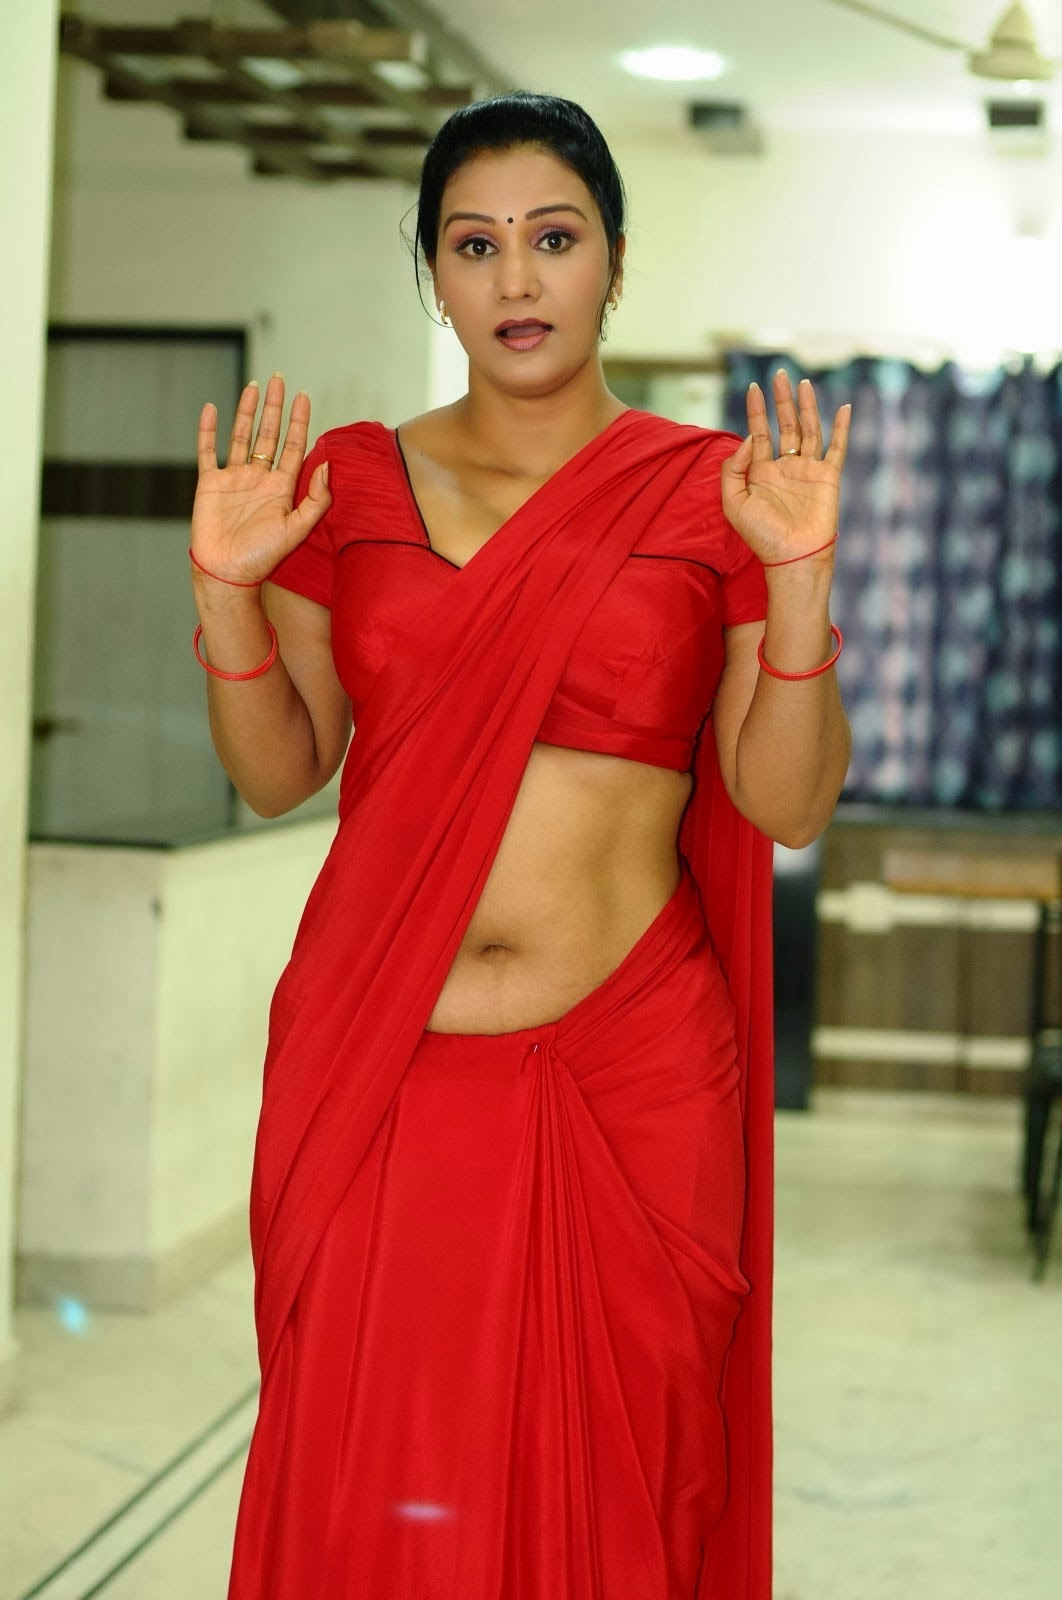 Apoorva Aunty Low Hip Red Saree Navel Show HQ Pics - Actress Low Hip ...